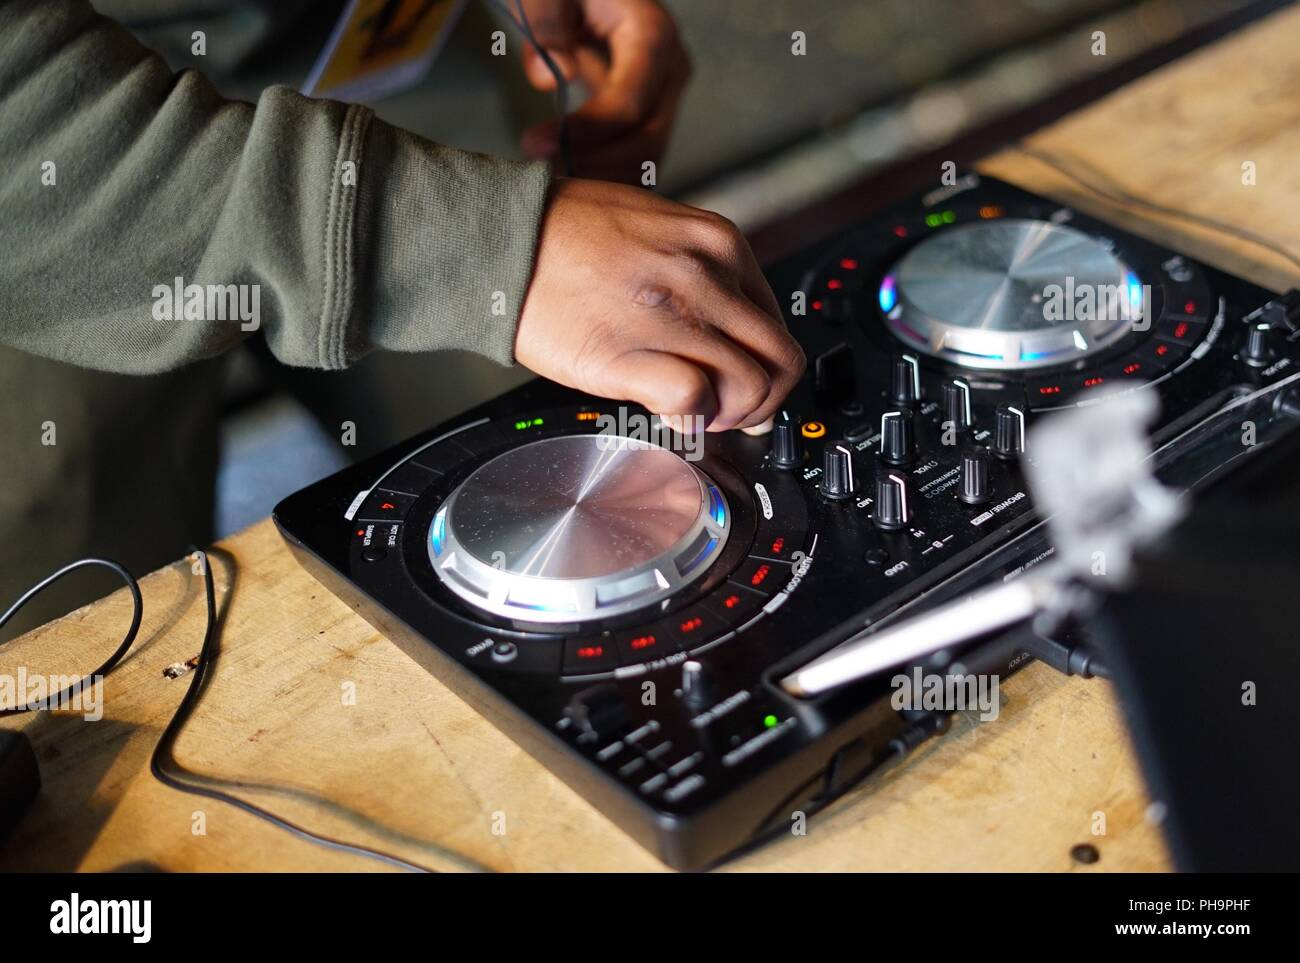 DJ spinning tunes on deck - Stock Image